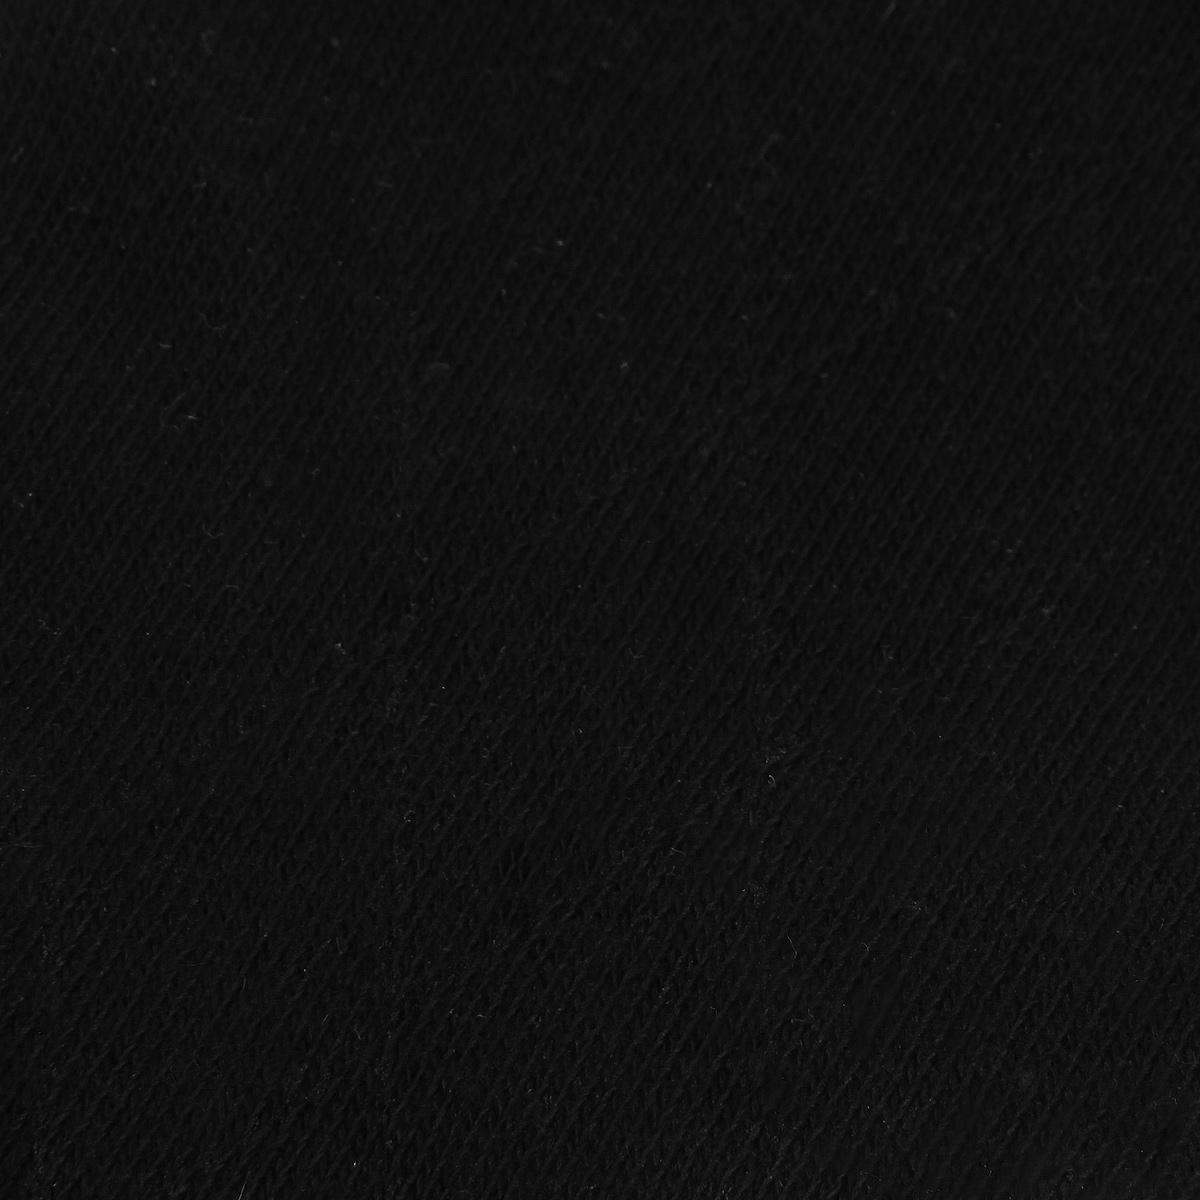 Носки мужские Arktur, цвет:  черный.  J 010.  Размер 43/45 Arktur